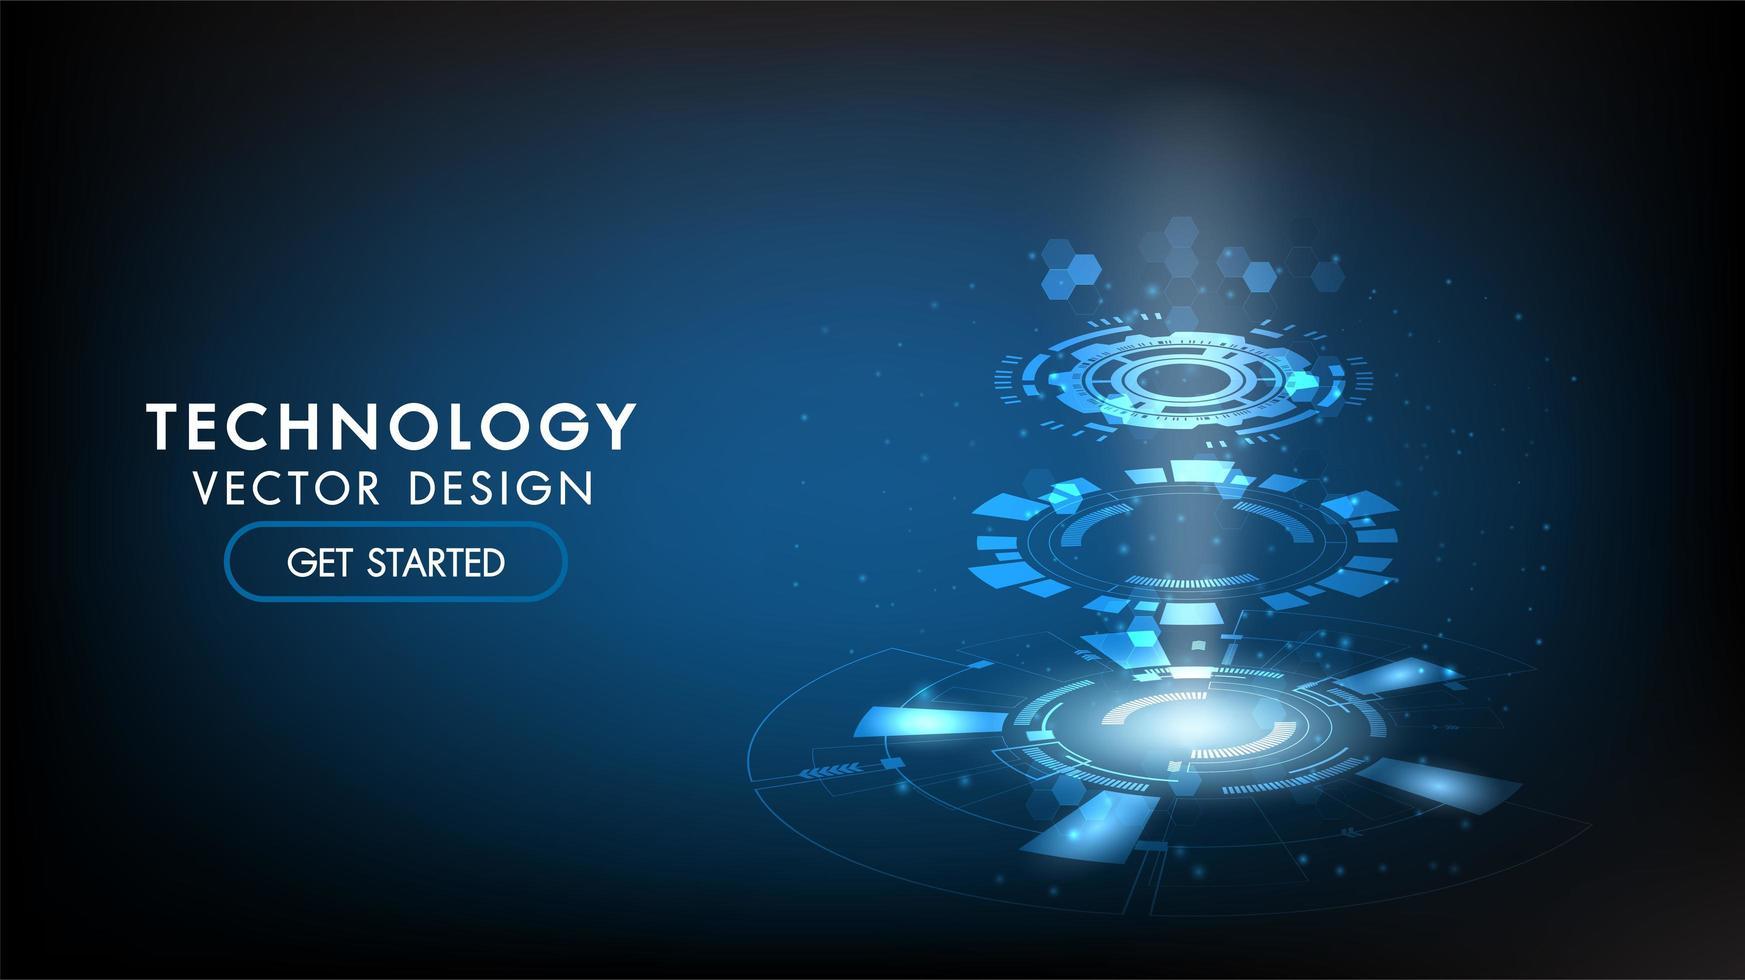 Abstracte technologie achtergrond Hi-tech communicatie concept technologie vector